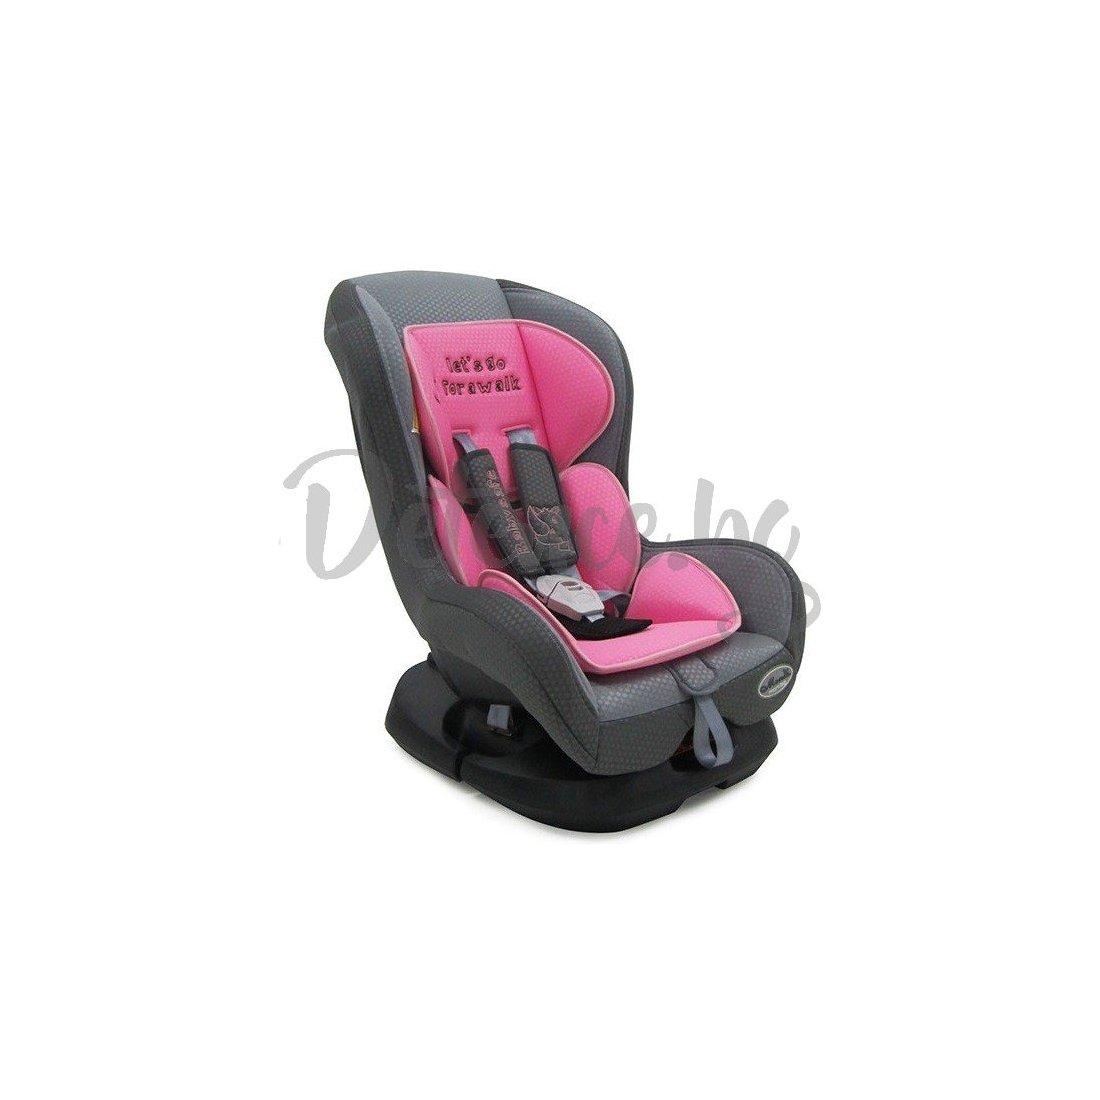 Moni - Столче за кола Babysafe 2013 - Розово